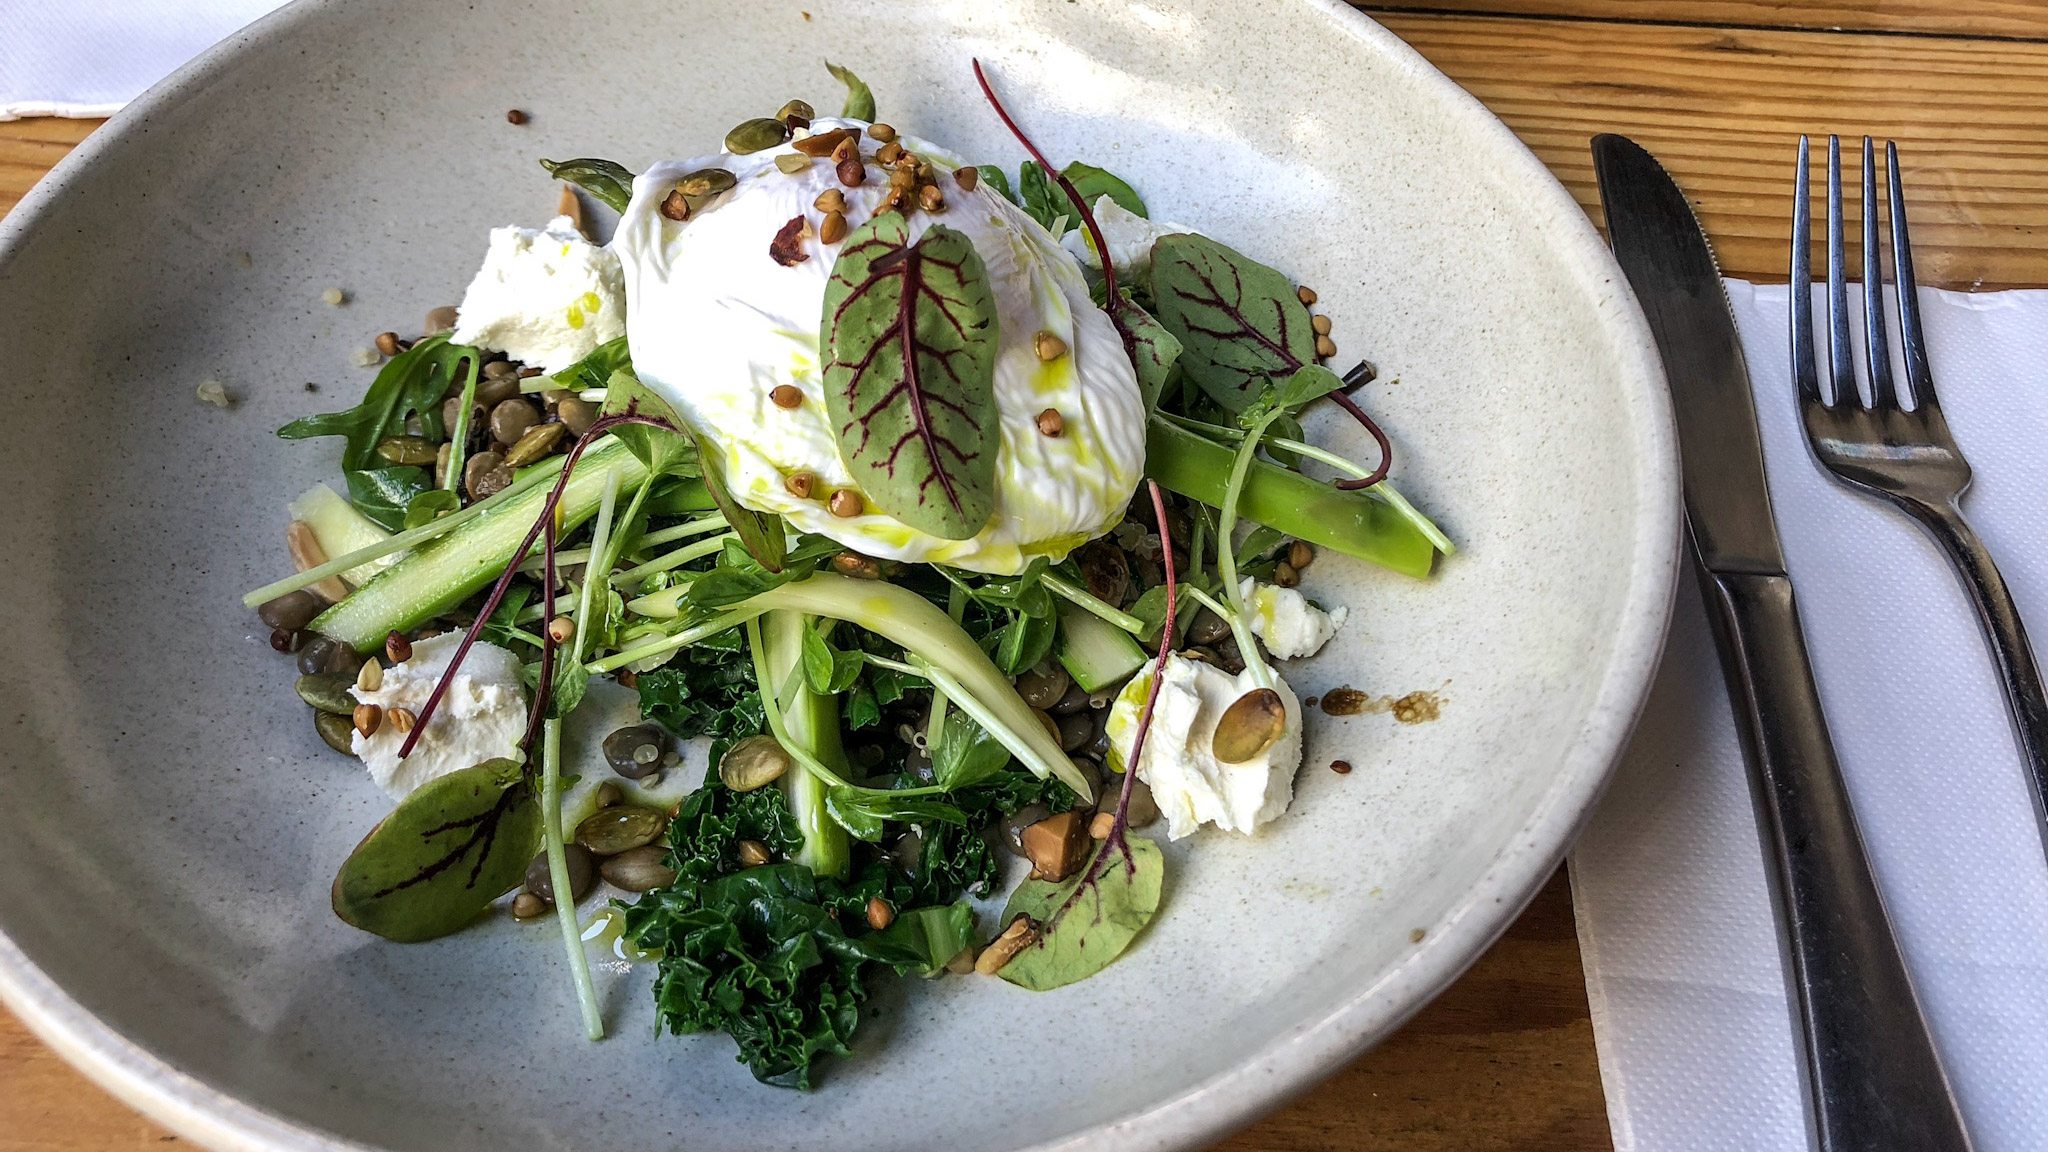 josephhyde_joseph_hyde_potts_point_sydney_darlinghurst_kingscross_cbd_restaurant_diner_cafe_eatery_brunch_breakfast_bowl_brunchbowl_greens_salad